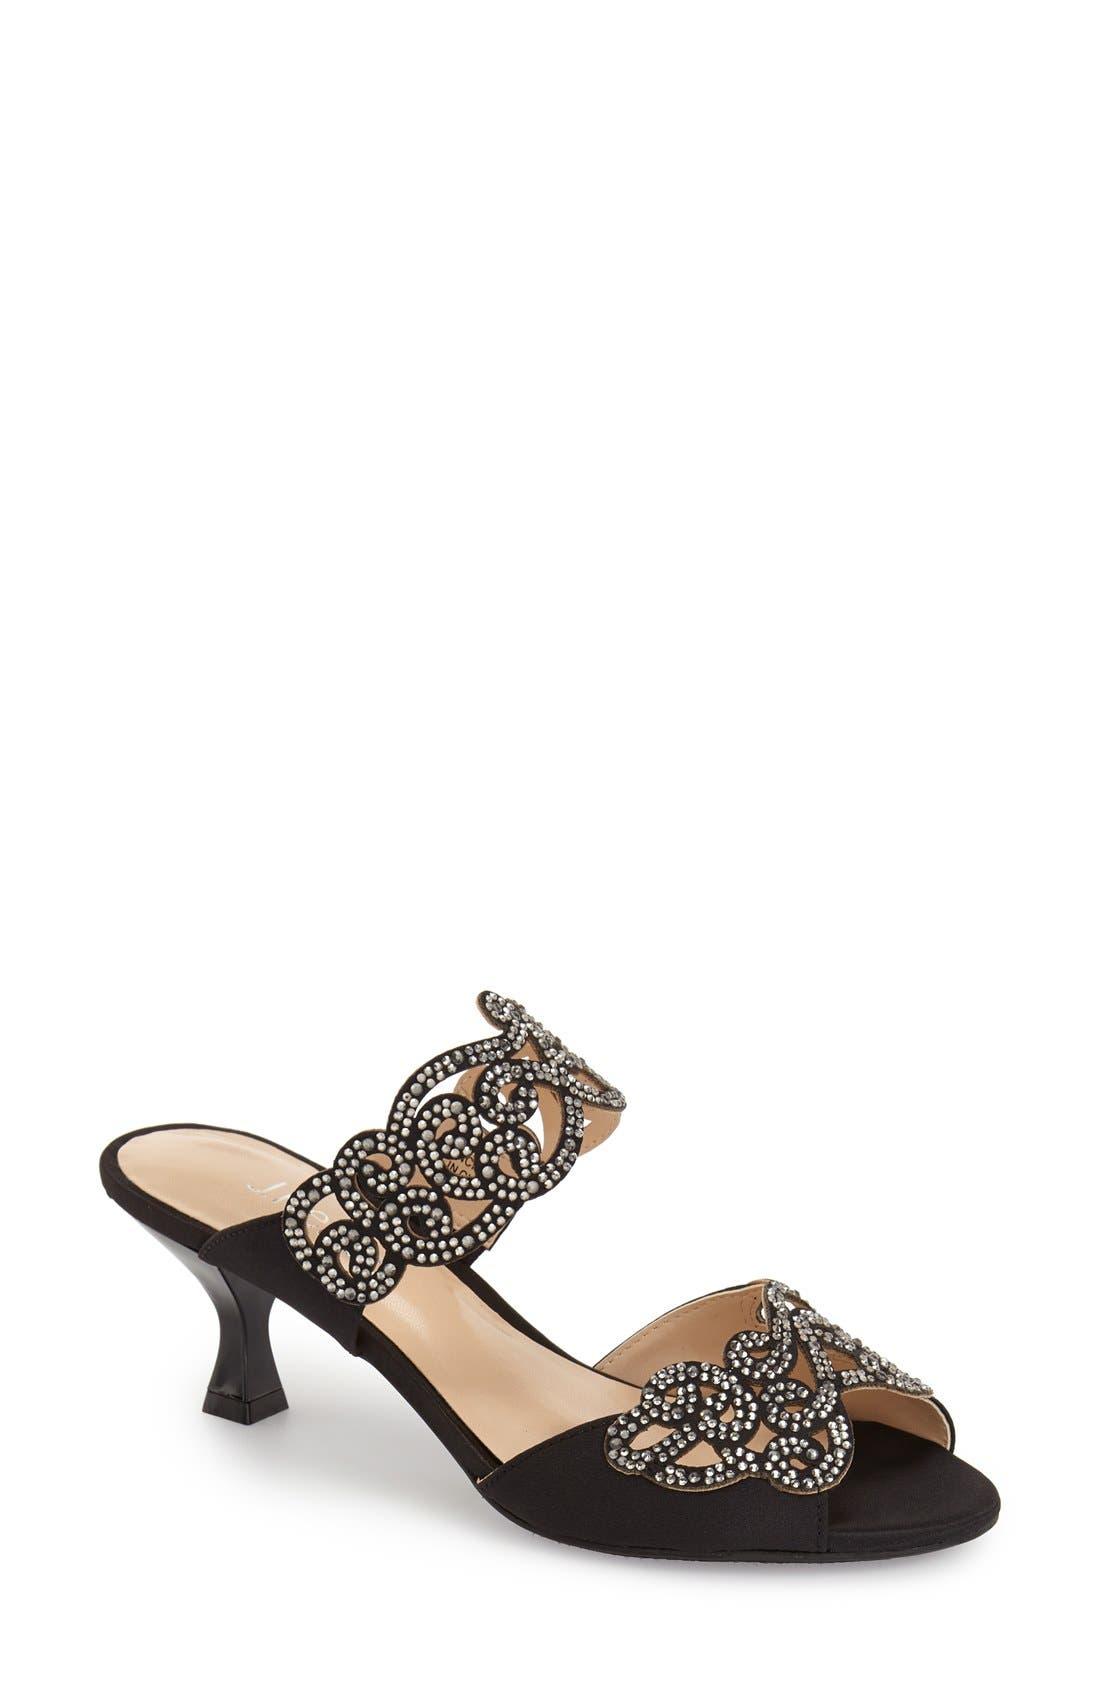 Main Image - J. Reneé 'Francie' Evening Sandal (Women)